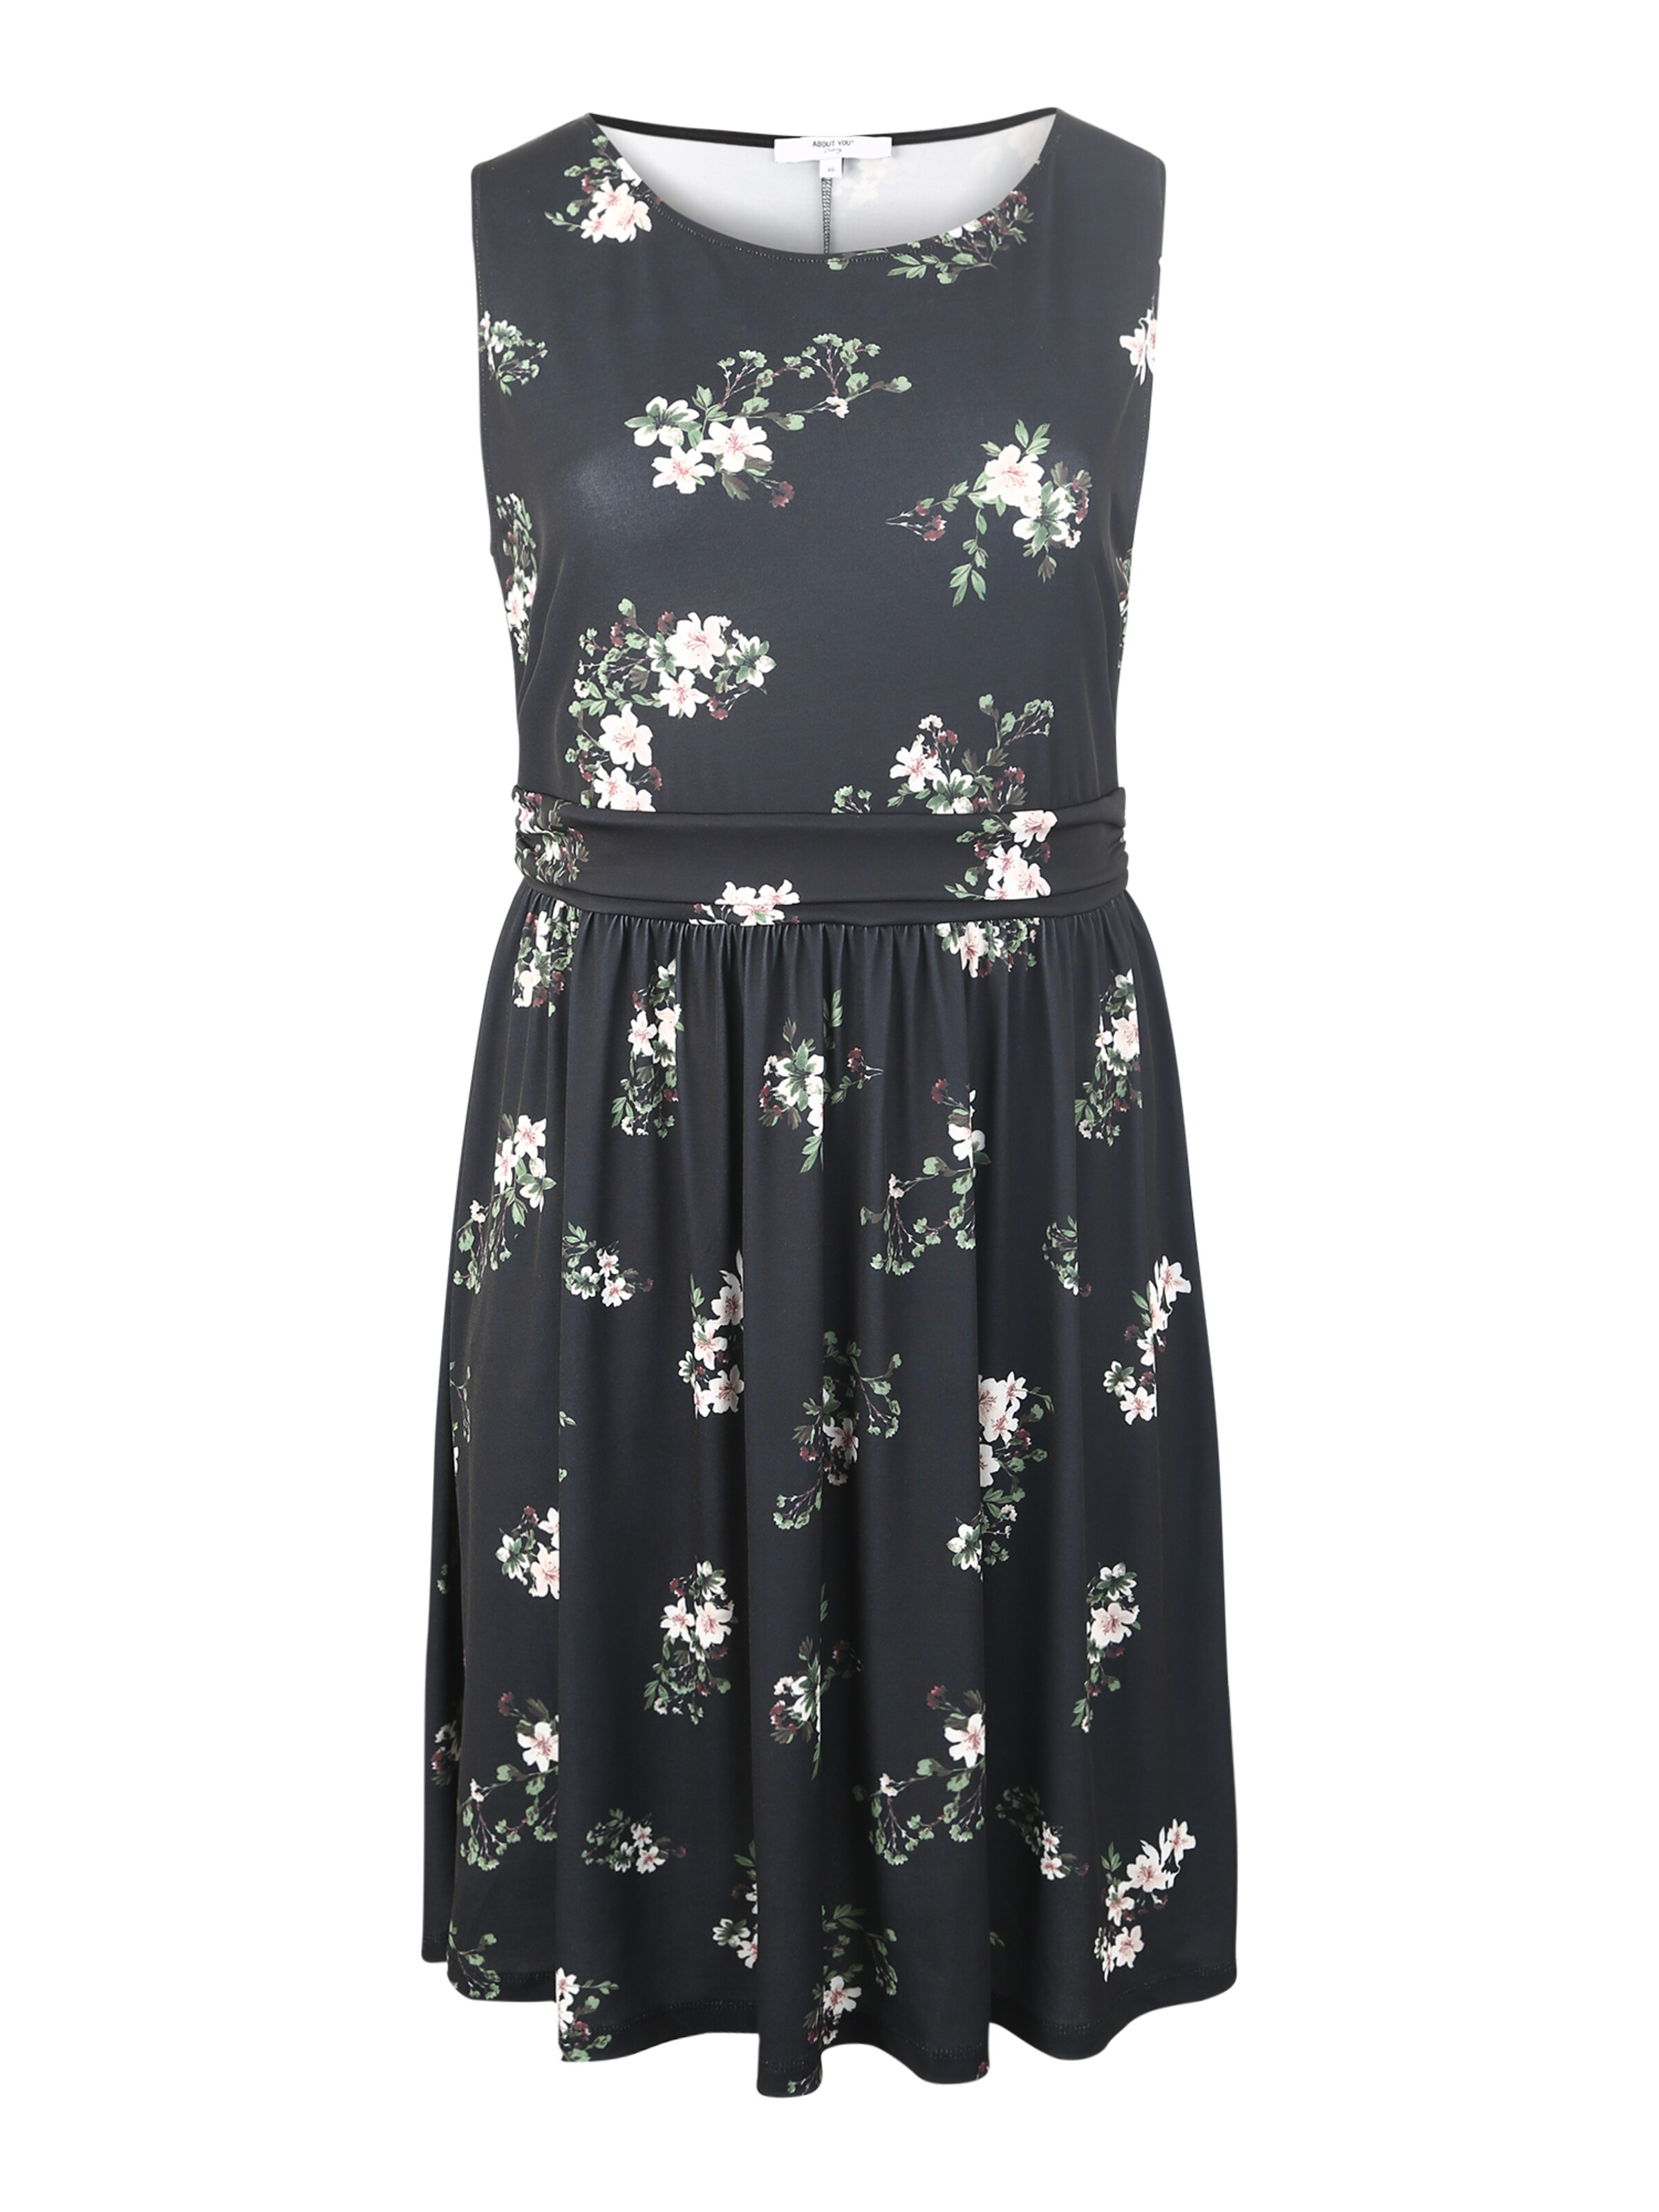 DunkelblauAltrosa Kleid You About In 'mieke' Curvy NwkZn8POX0